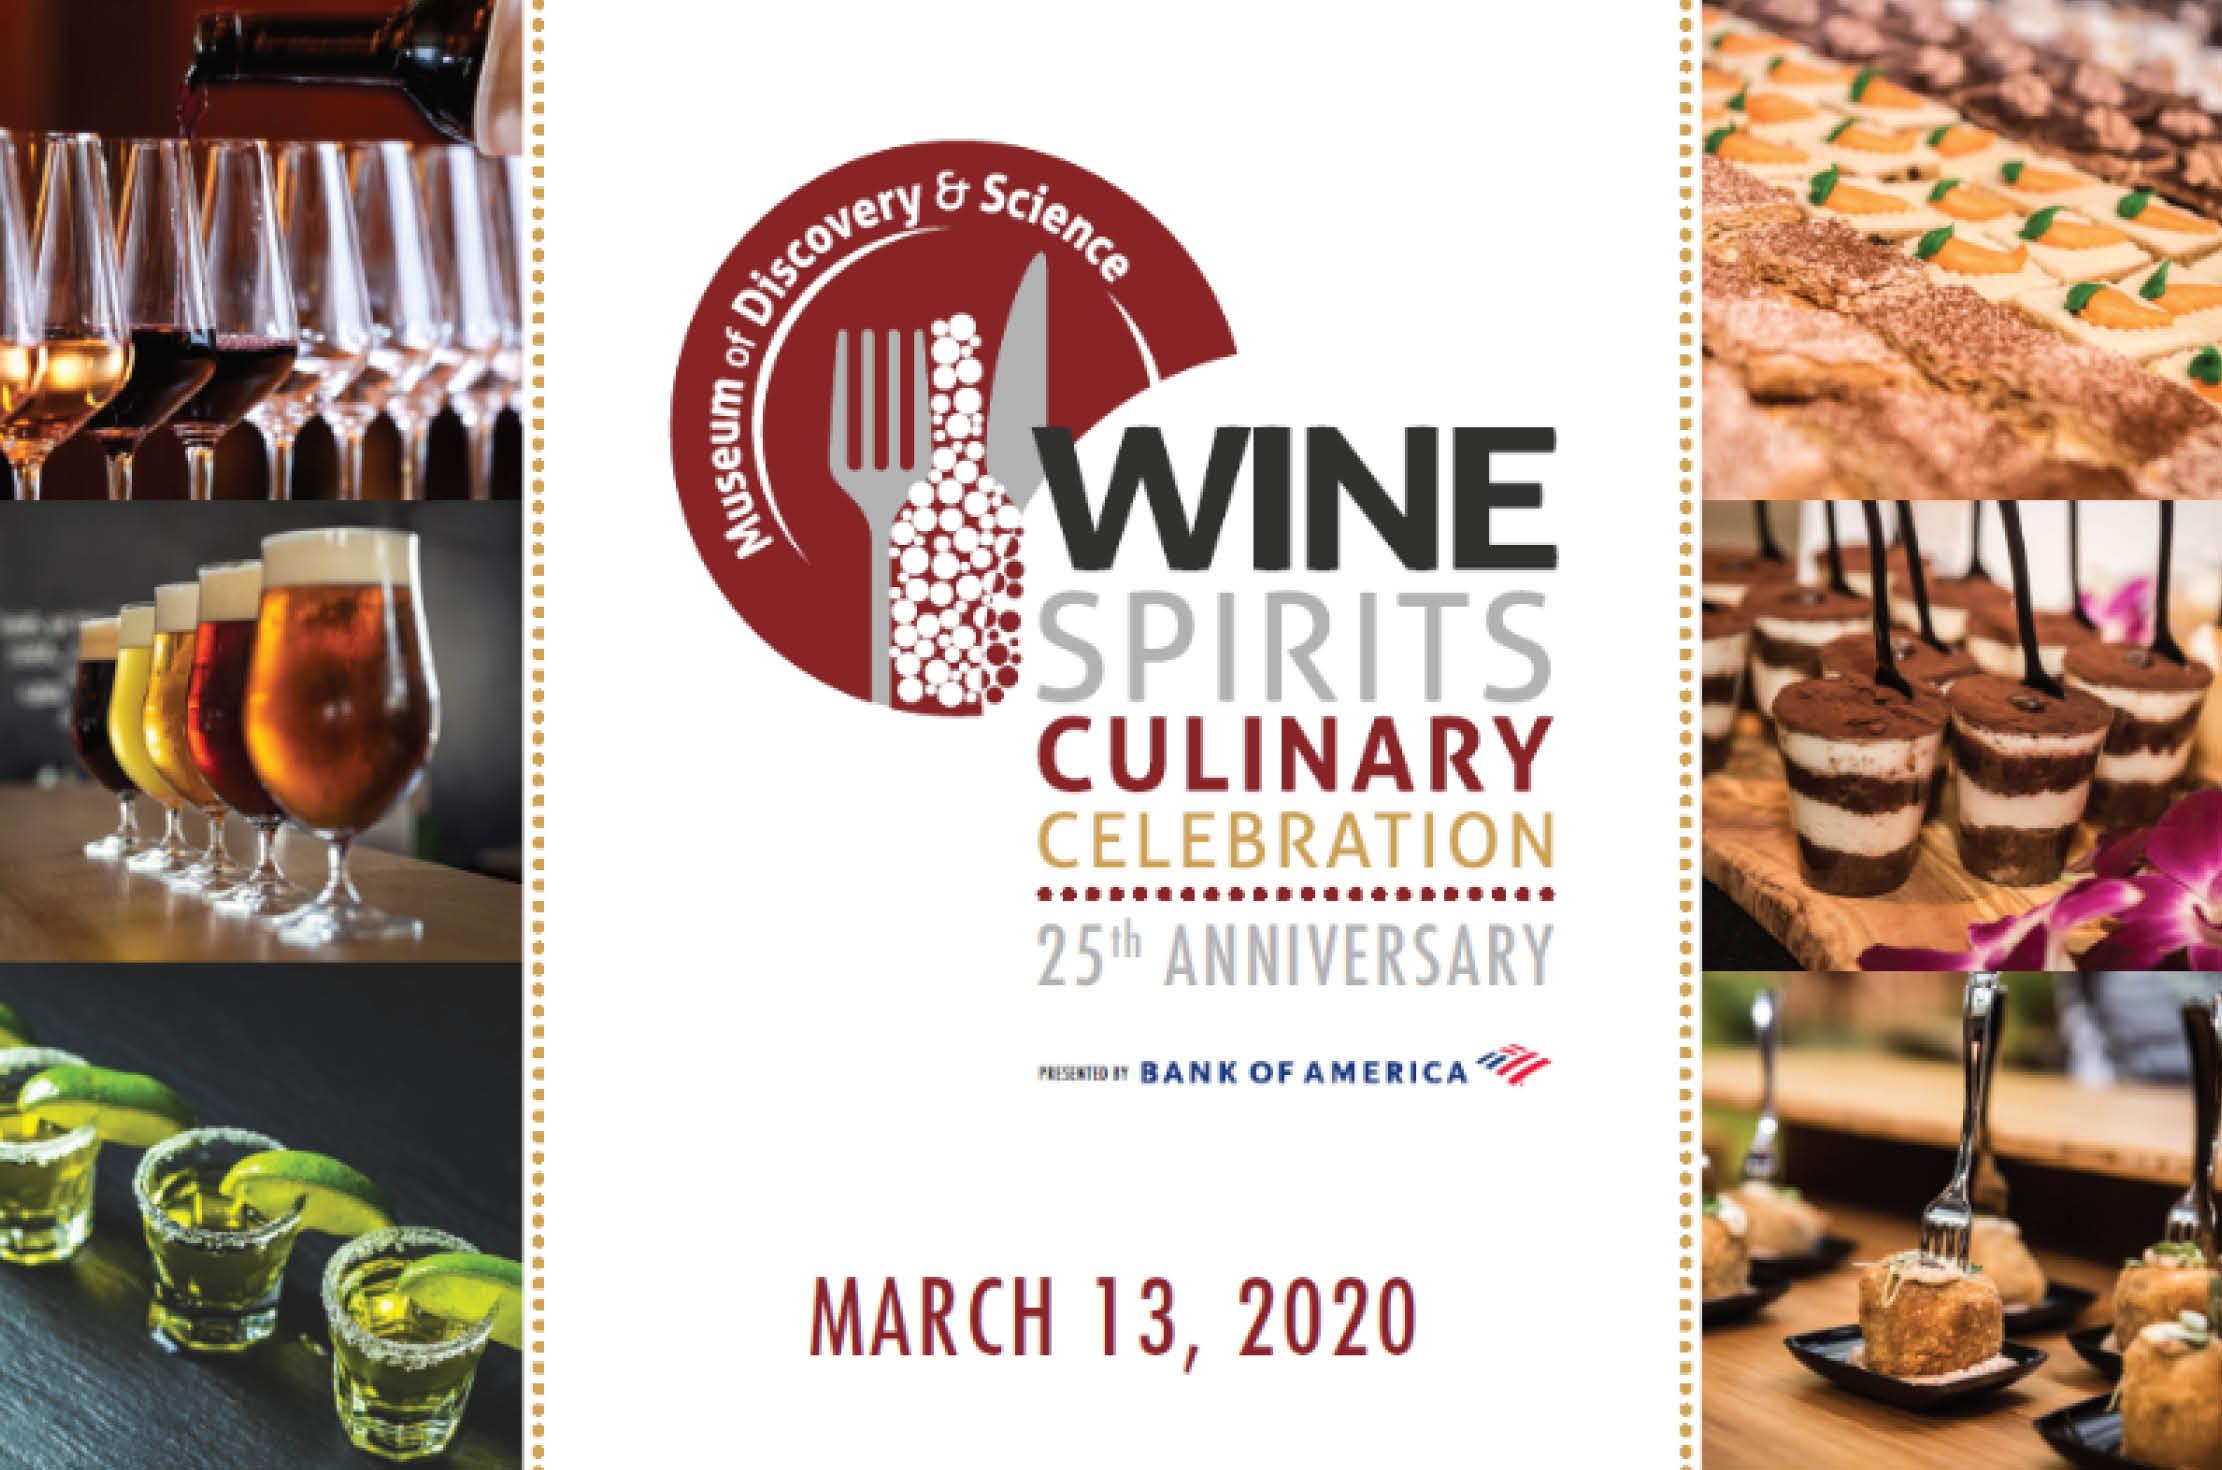 25th Annual Bank of America Wine, Spirits & Culinary Celebration